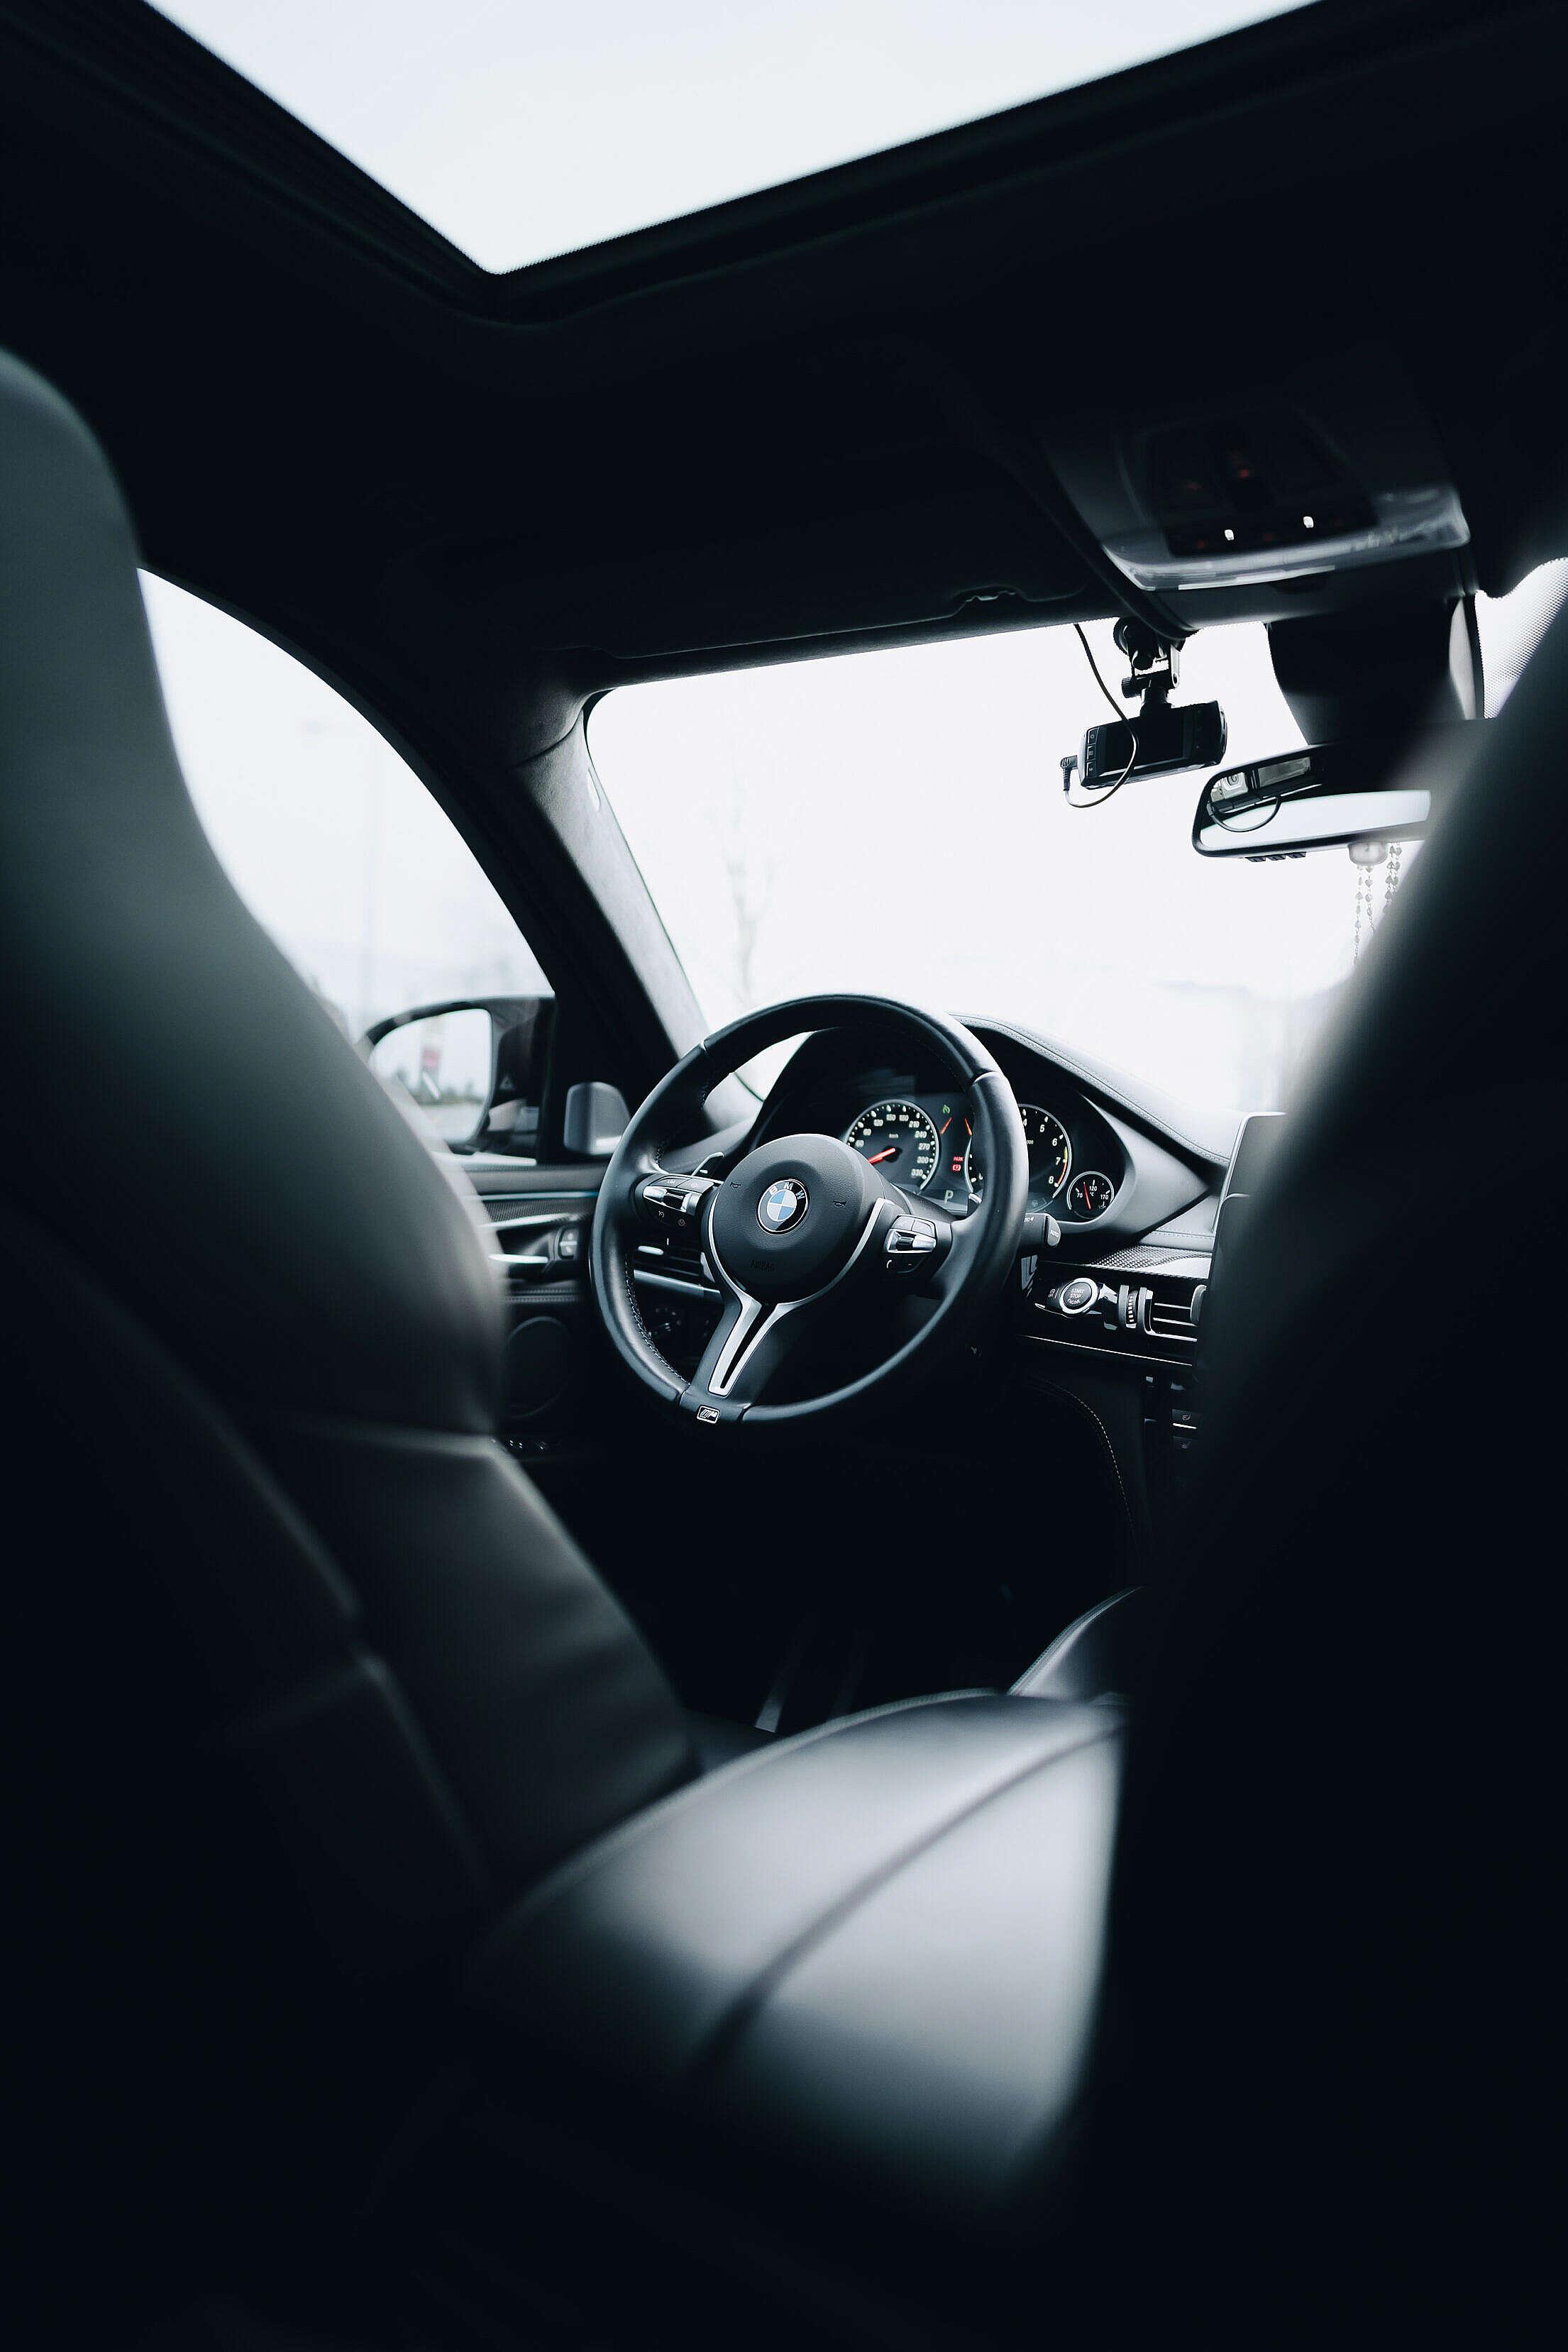 BMW Cockpit Interior Free Stock Photo